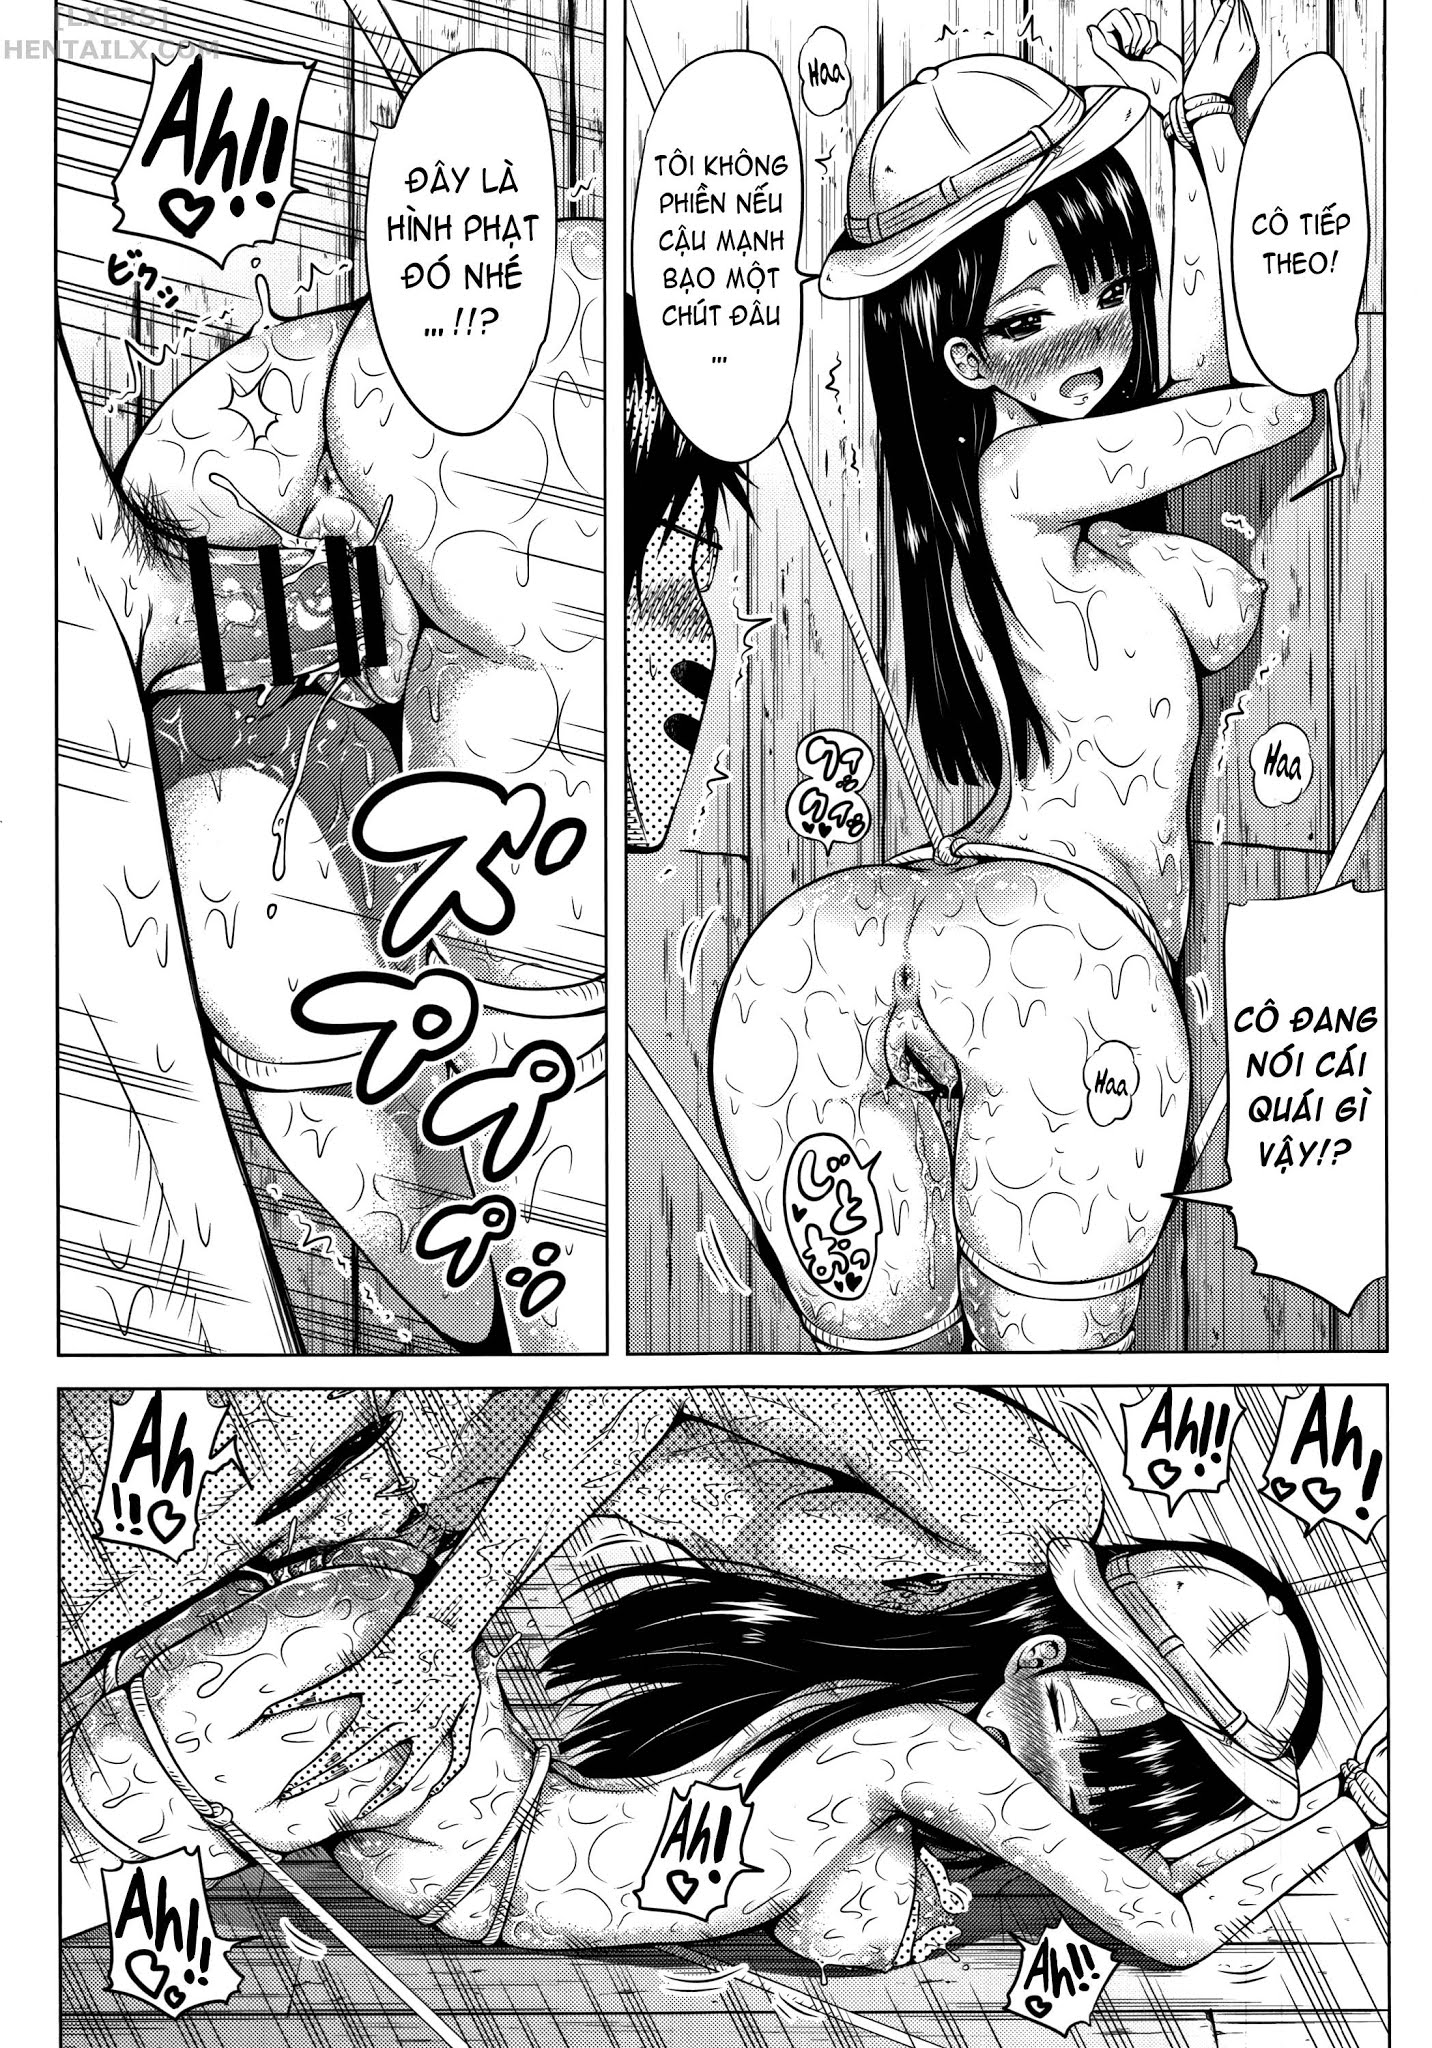 biribiri_Lovemare_226%2Bcopy Lovemare Jou  - hentaicube.net - Truyện tranh hentai online